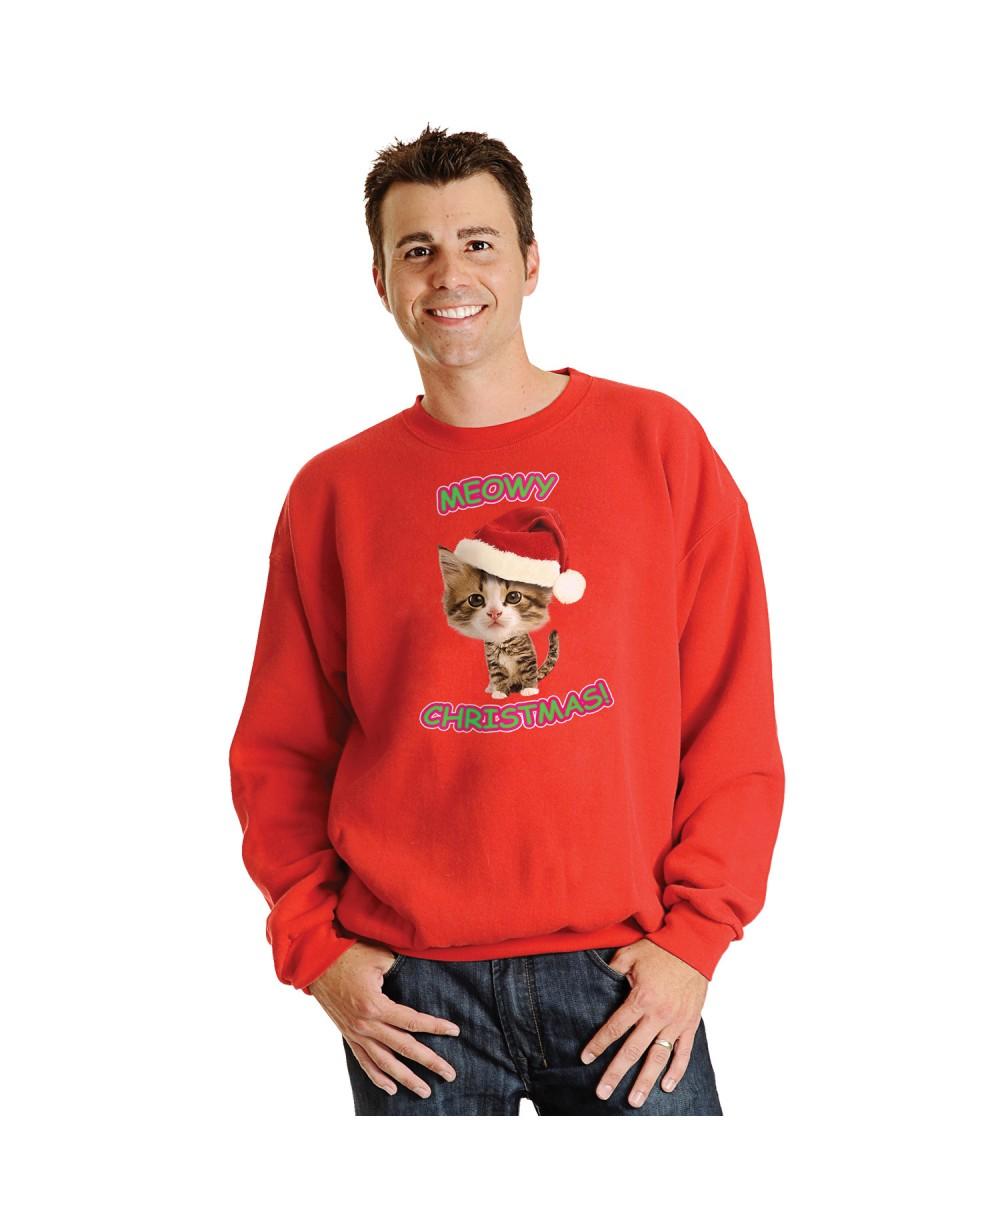 Caroling Kitty Ugly Christmas Sweater